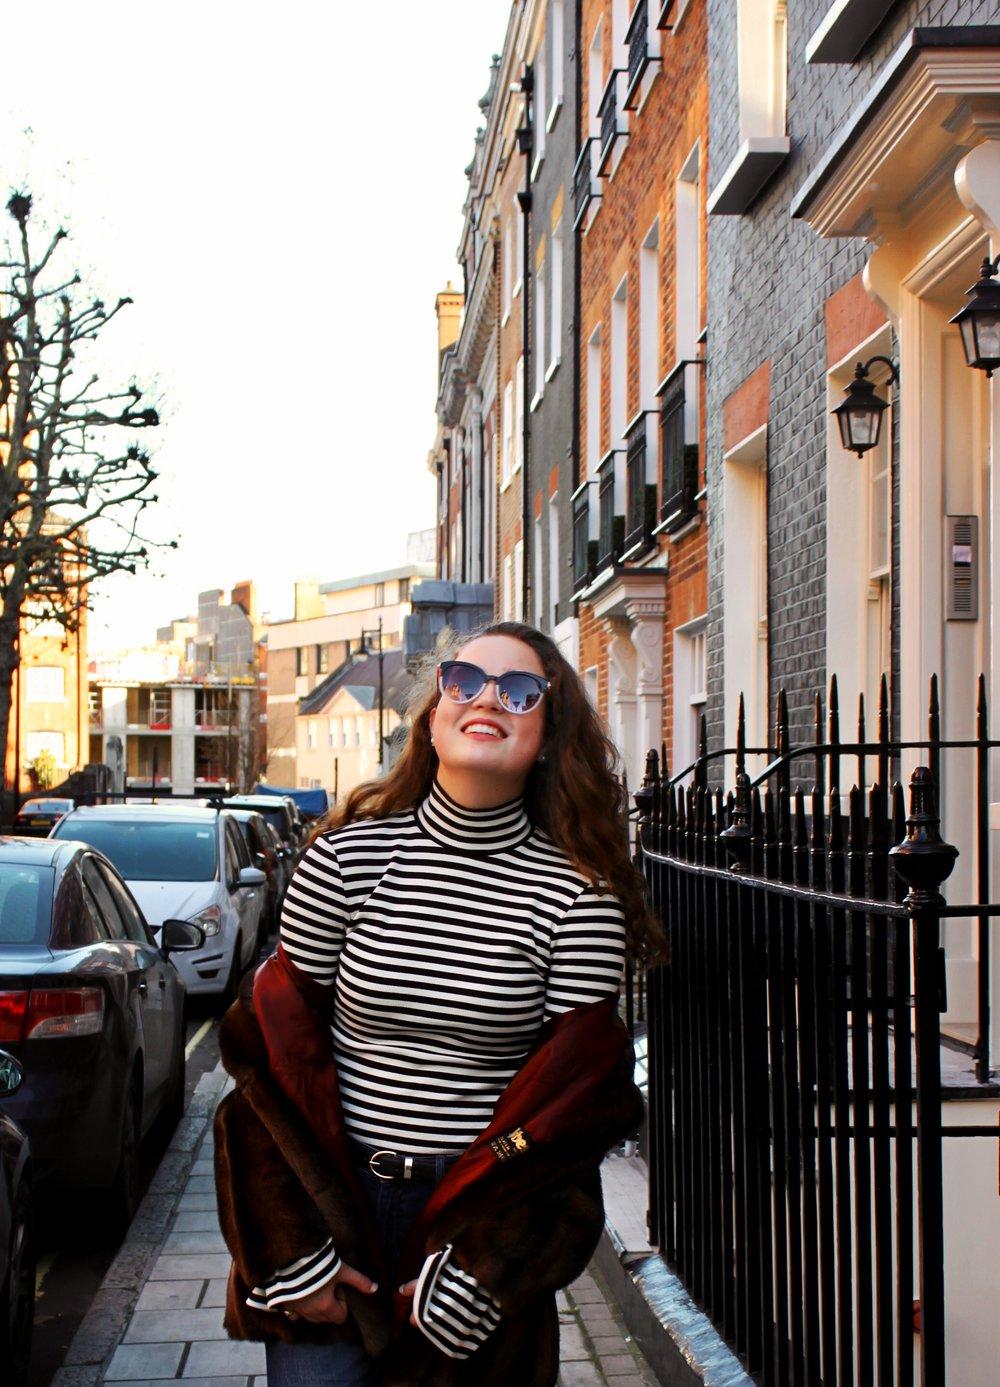 Joyful Cady Quotidienne Mayfair.jpg